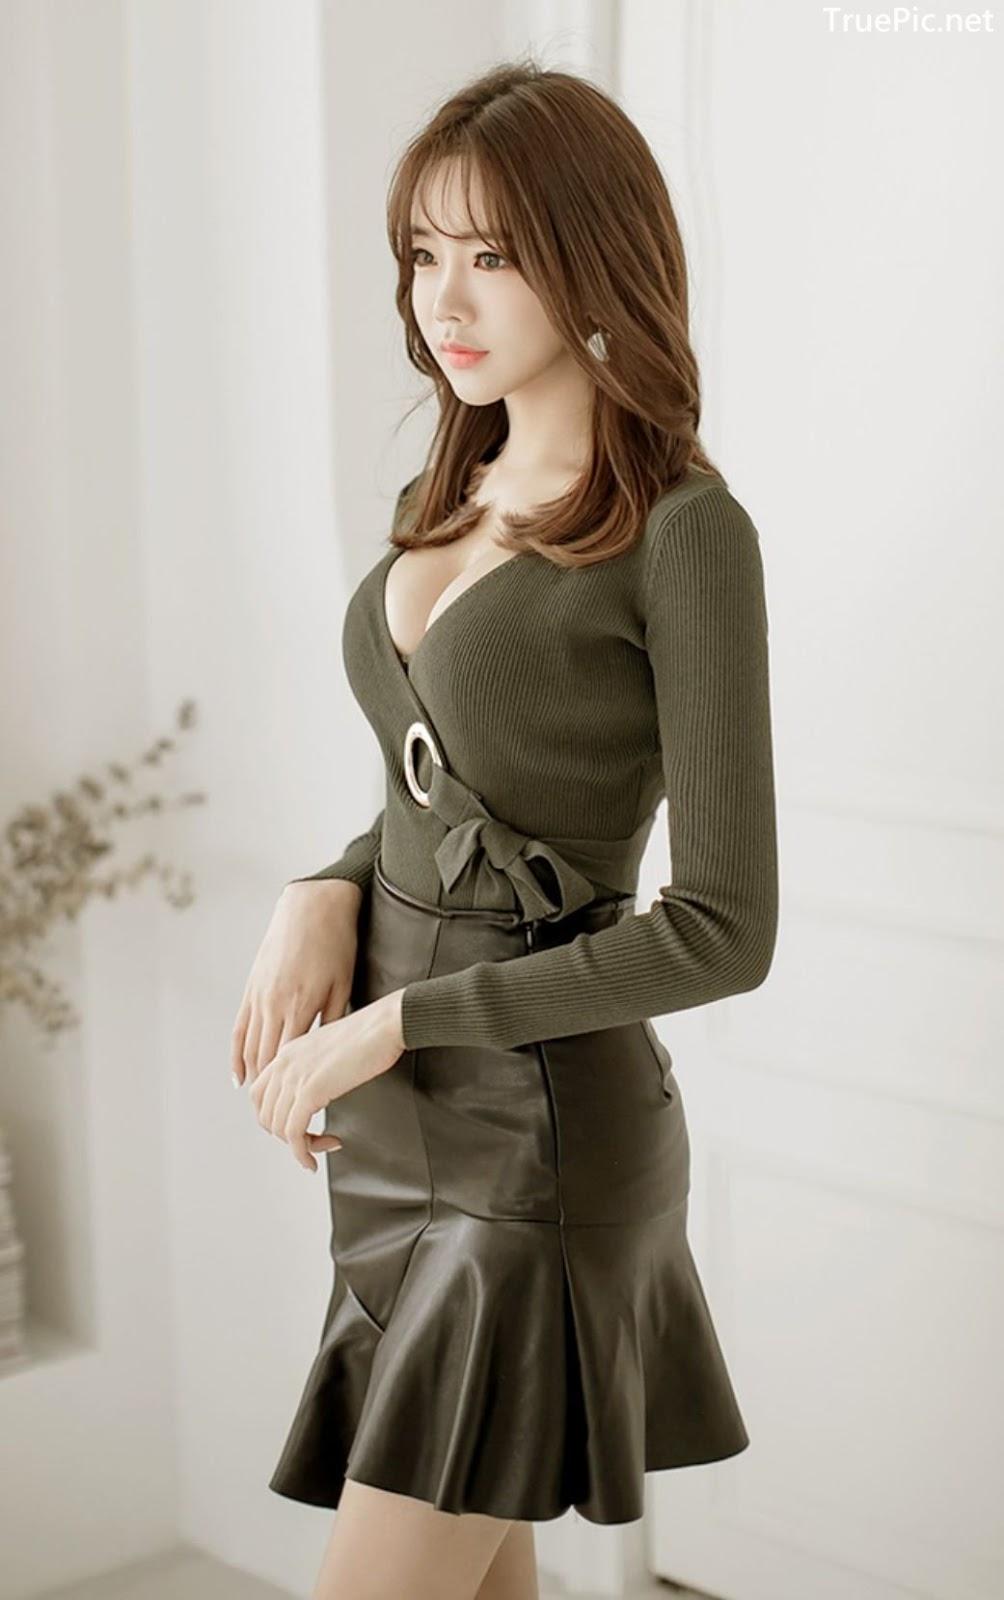 Image-Korean-Fashion-Model–Kang-Eun-Wook–Indoor-Photoshoot-Collection-2-TruePic.net- Picture-4